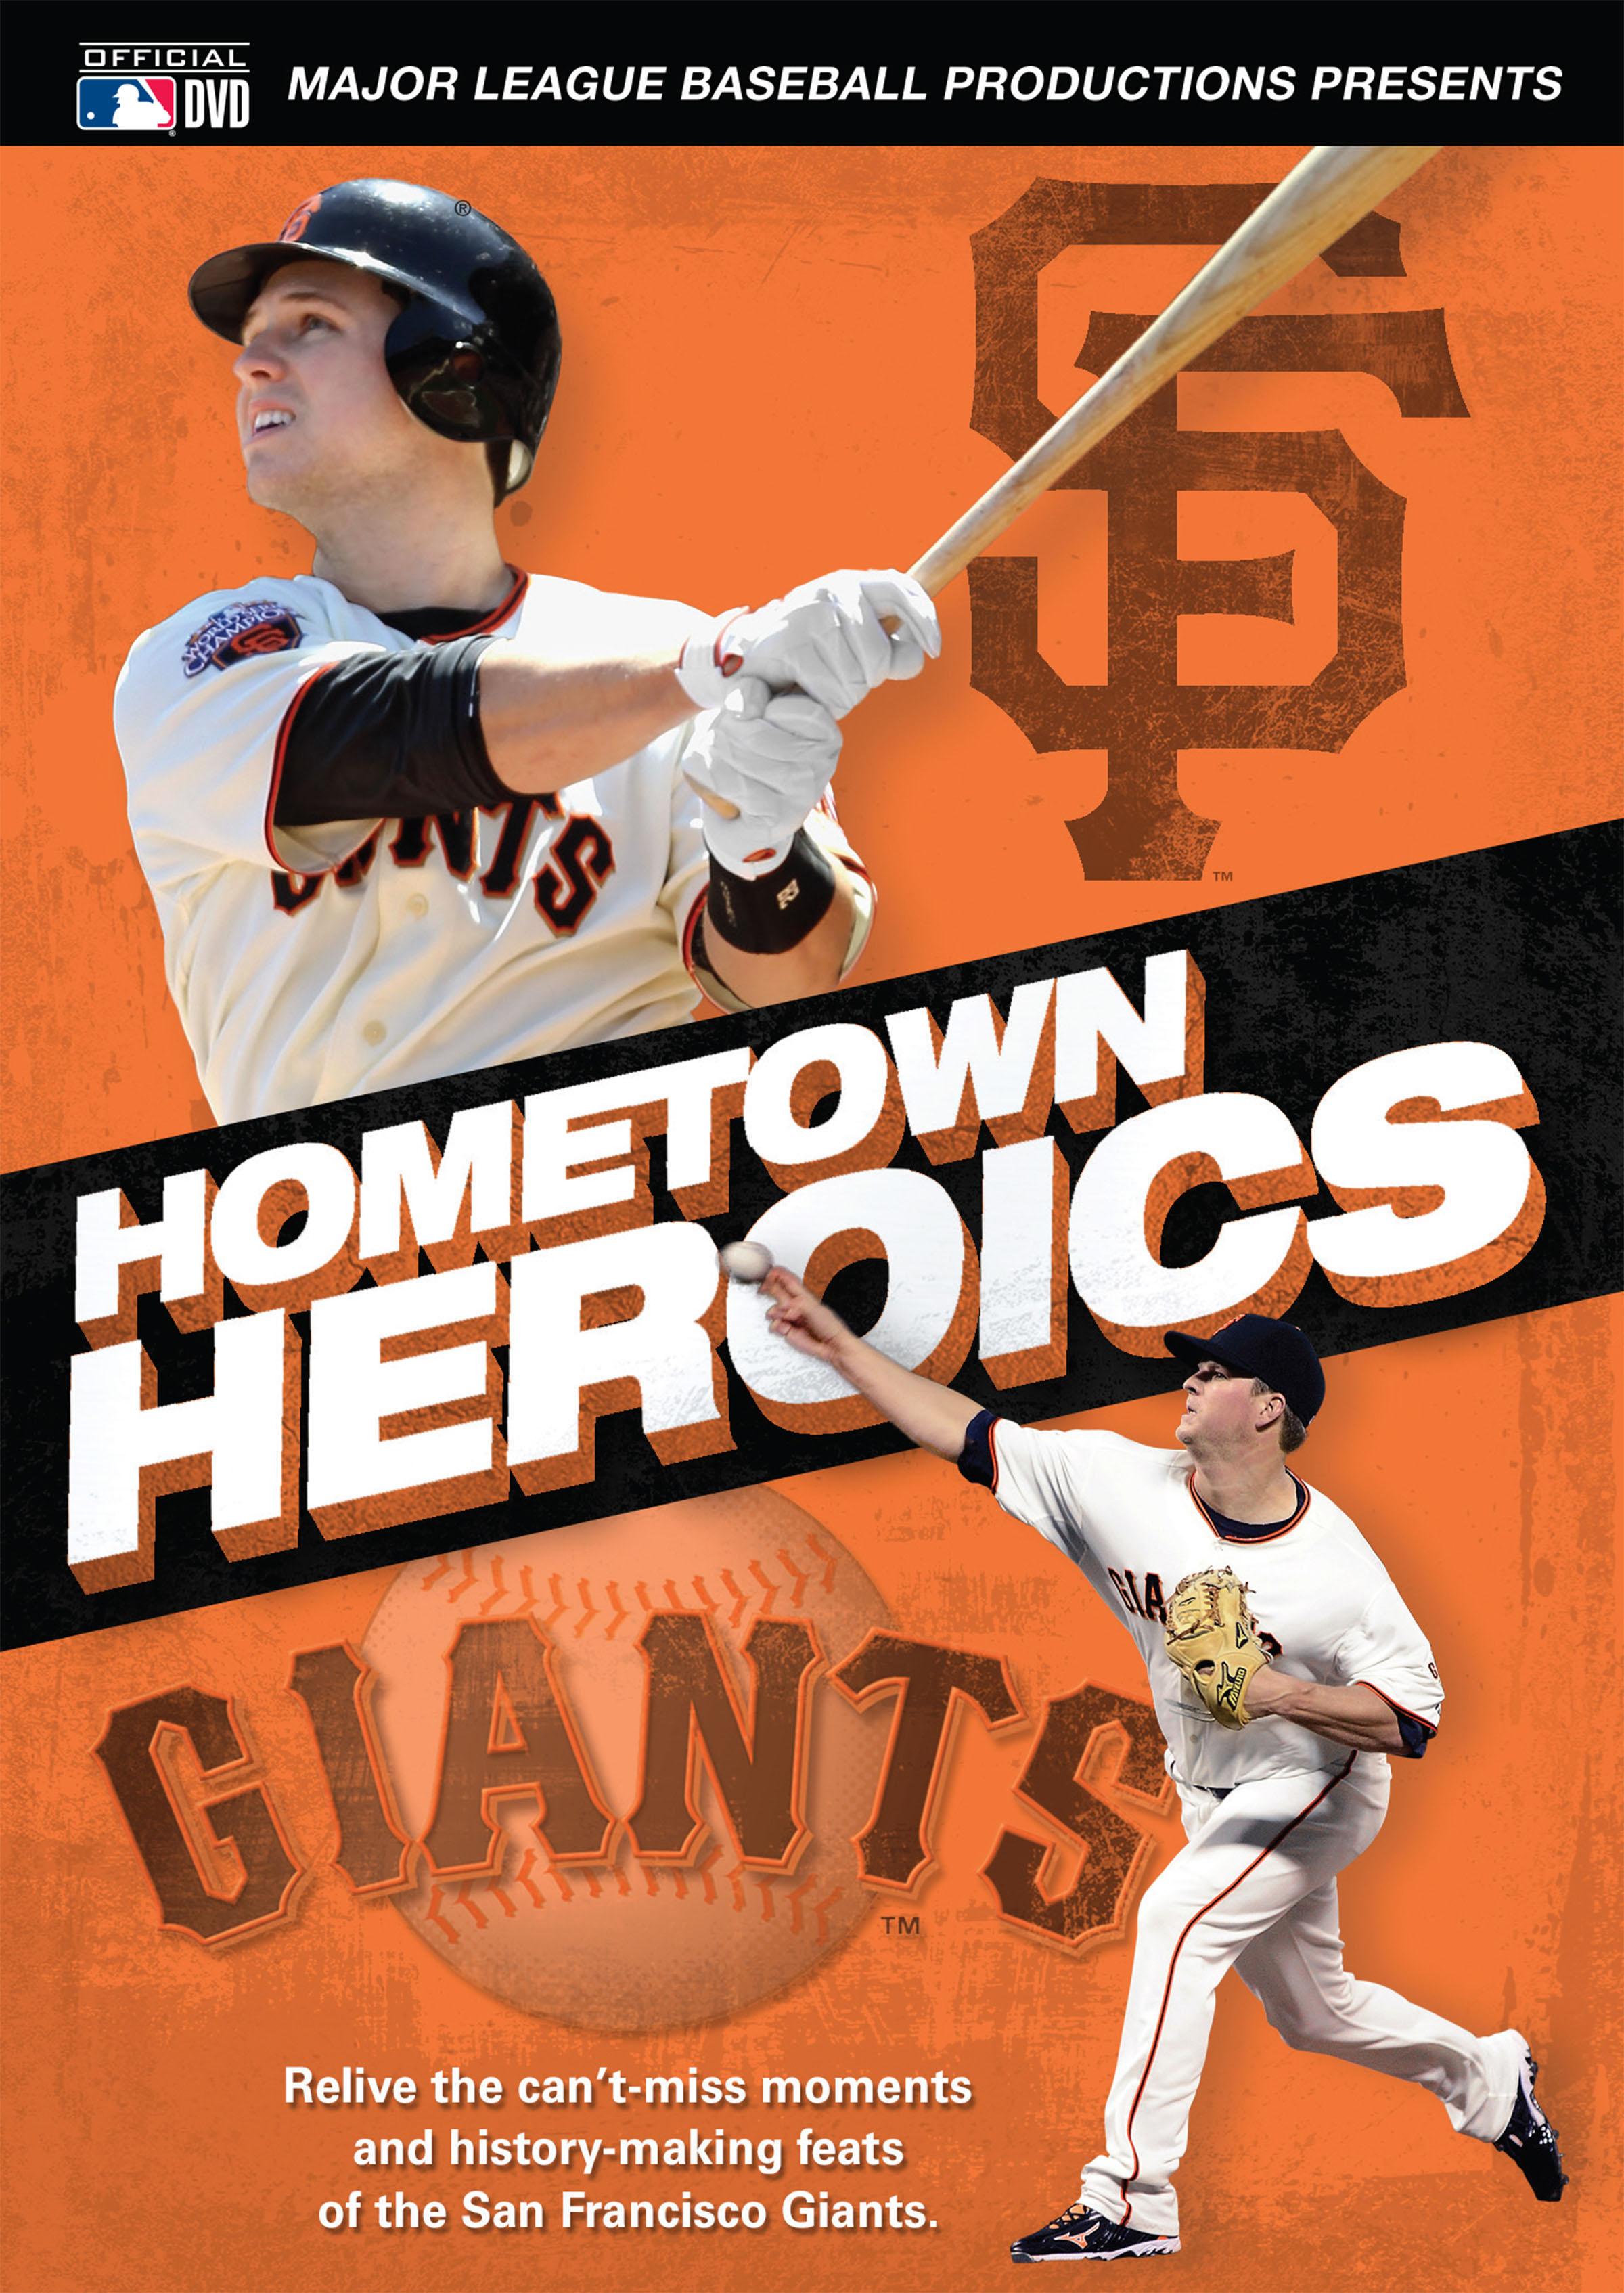 MLB: San Francisco Giants - Hometown Heroics